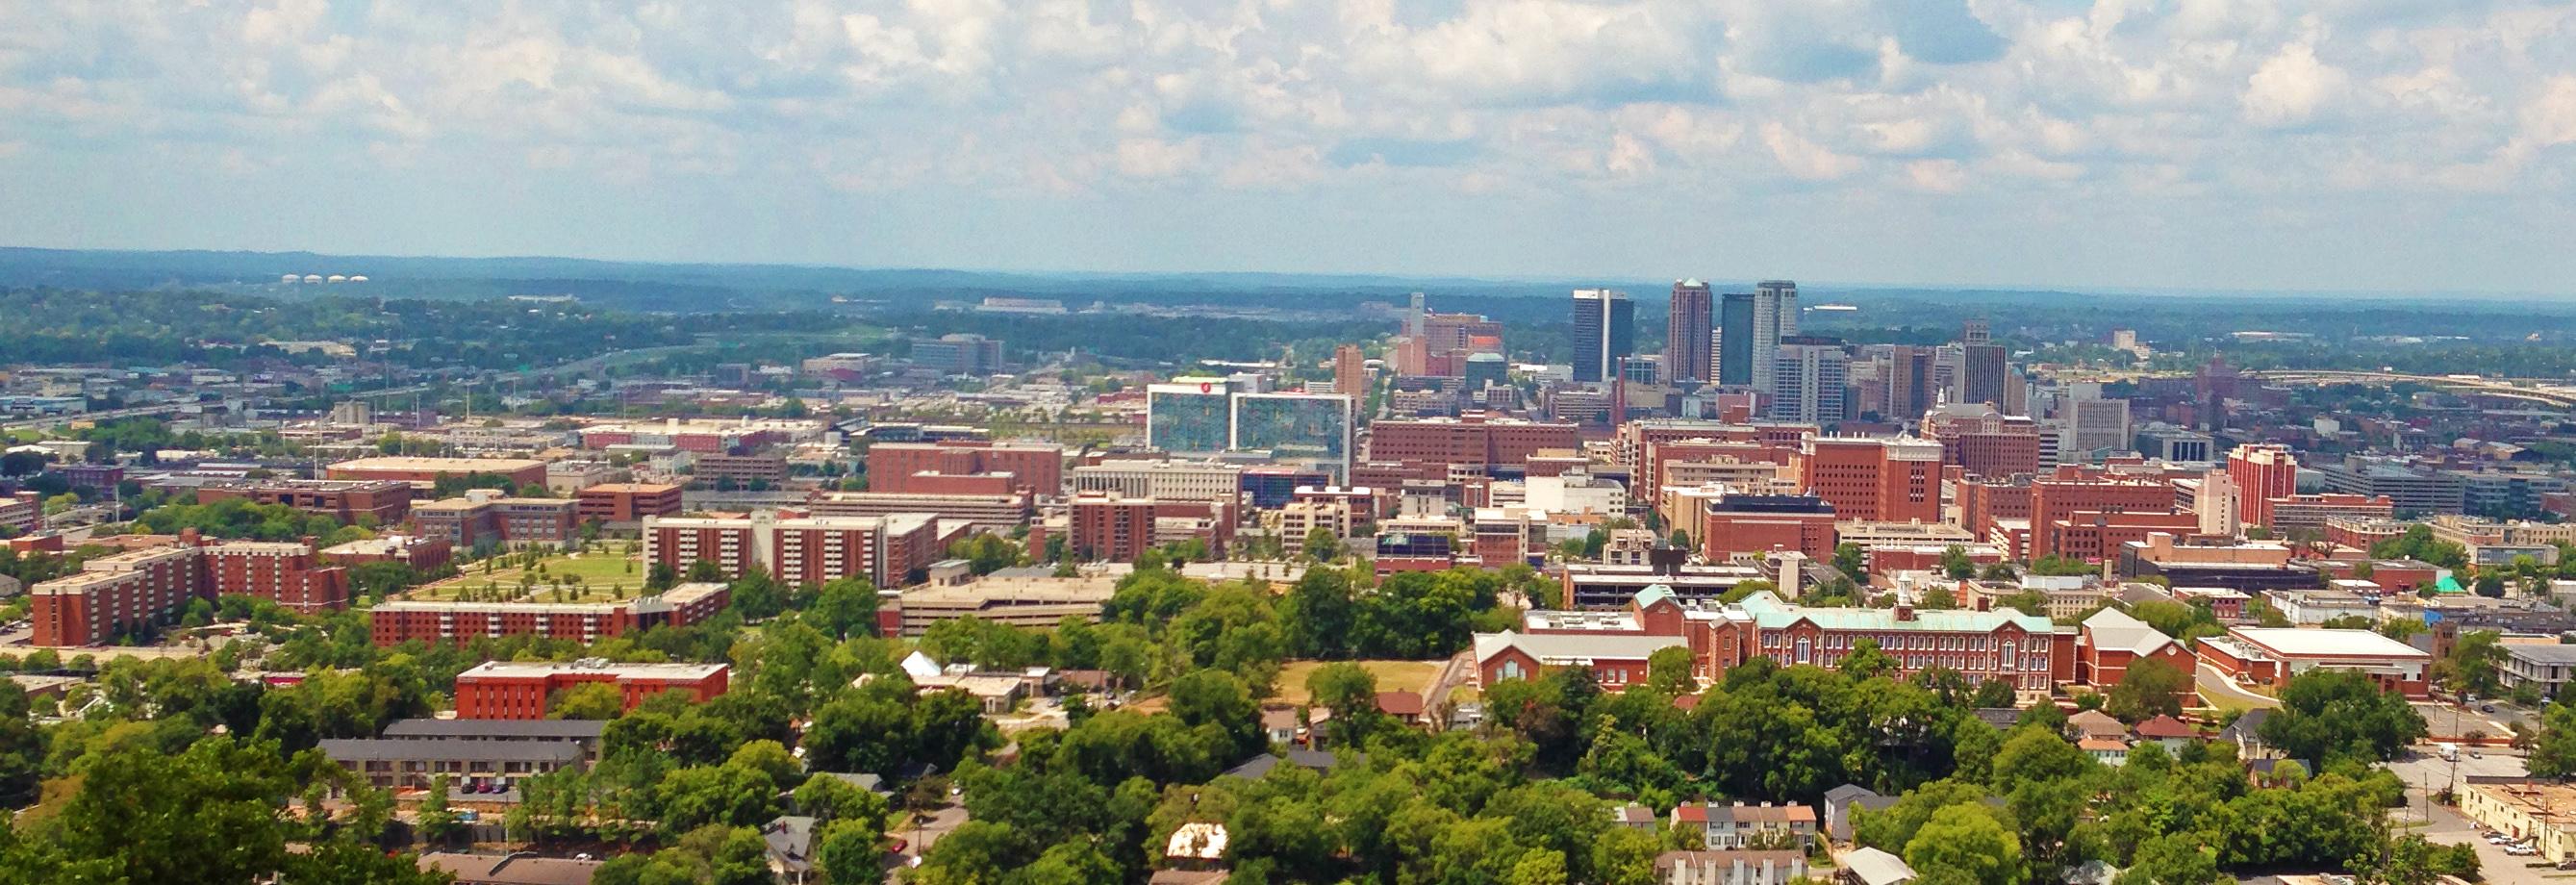 University_of_Alabama_at_Birmingham_Campus_from_Vulcan